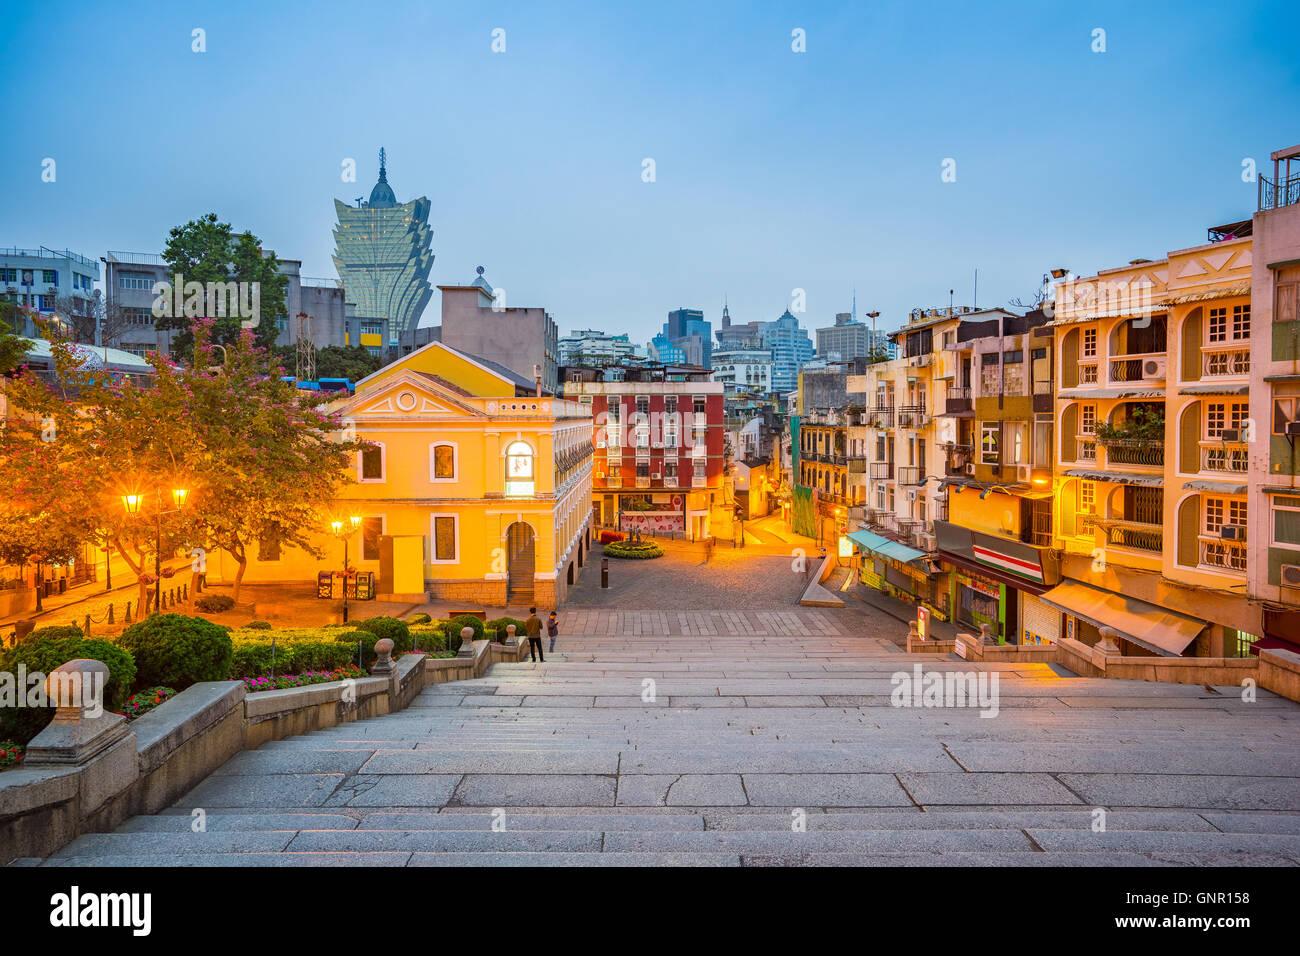 Vista del paisaje urbano de Macao, China . Imagen De Stock